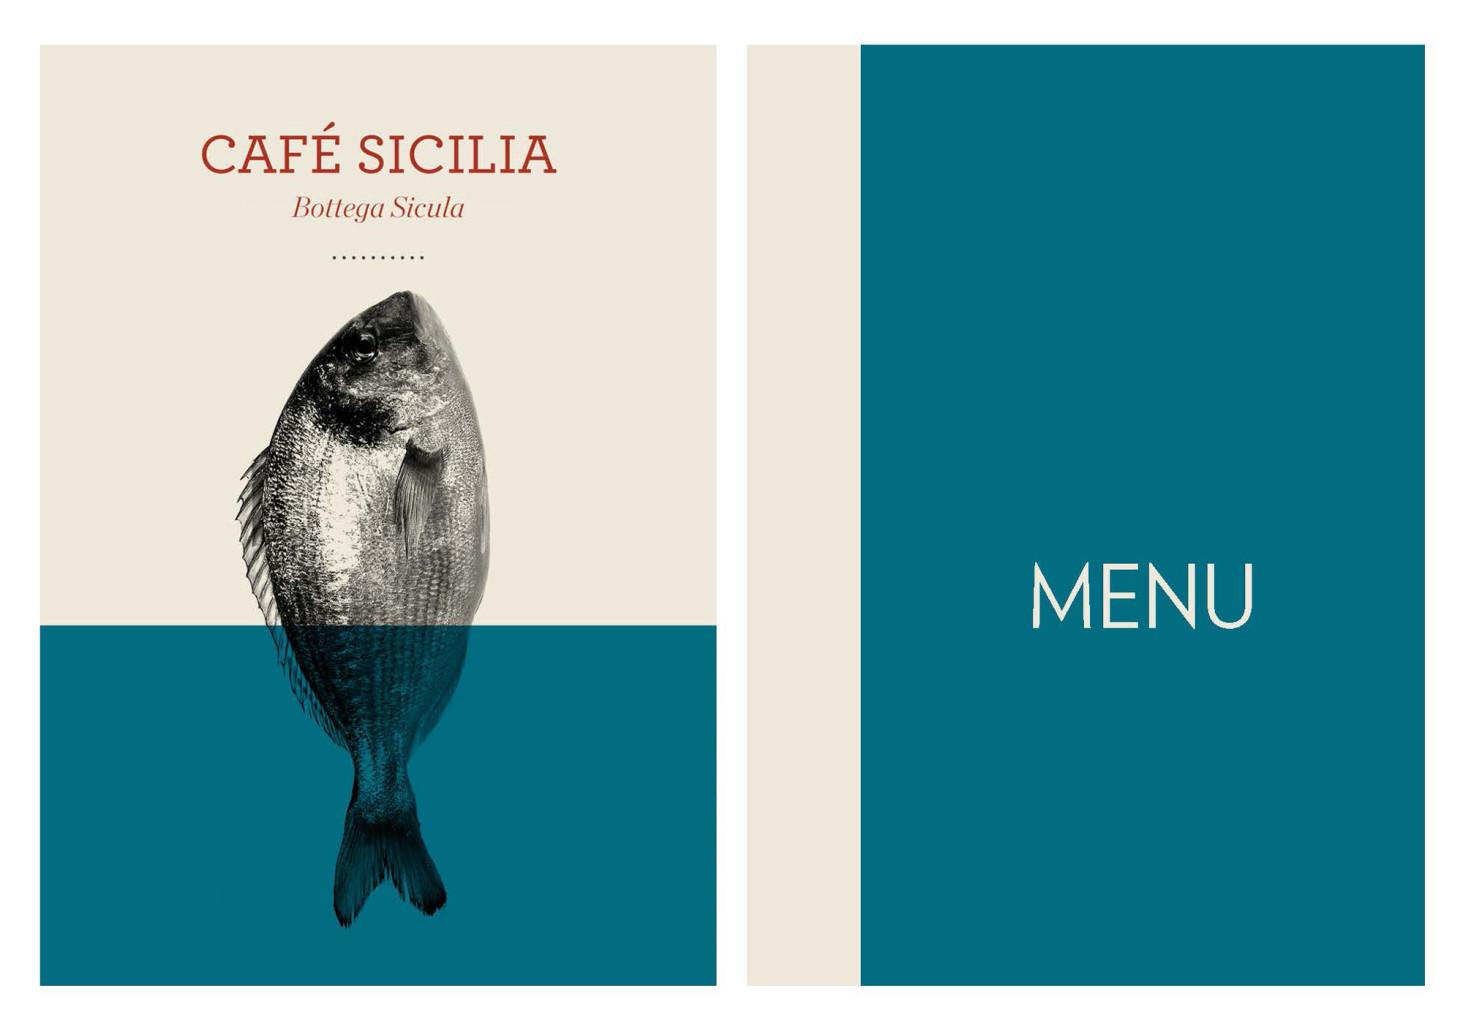 Cafe sicilia branding 5